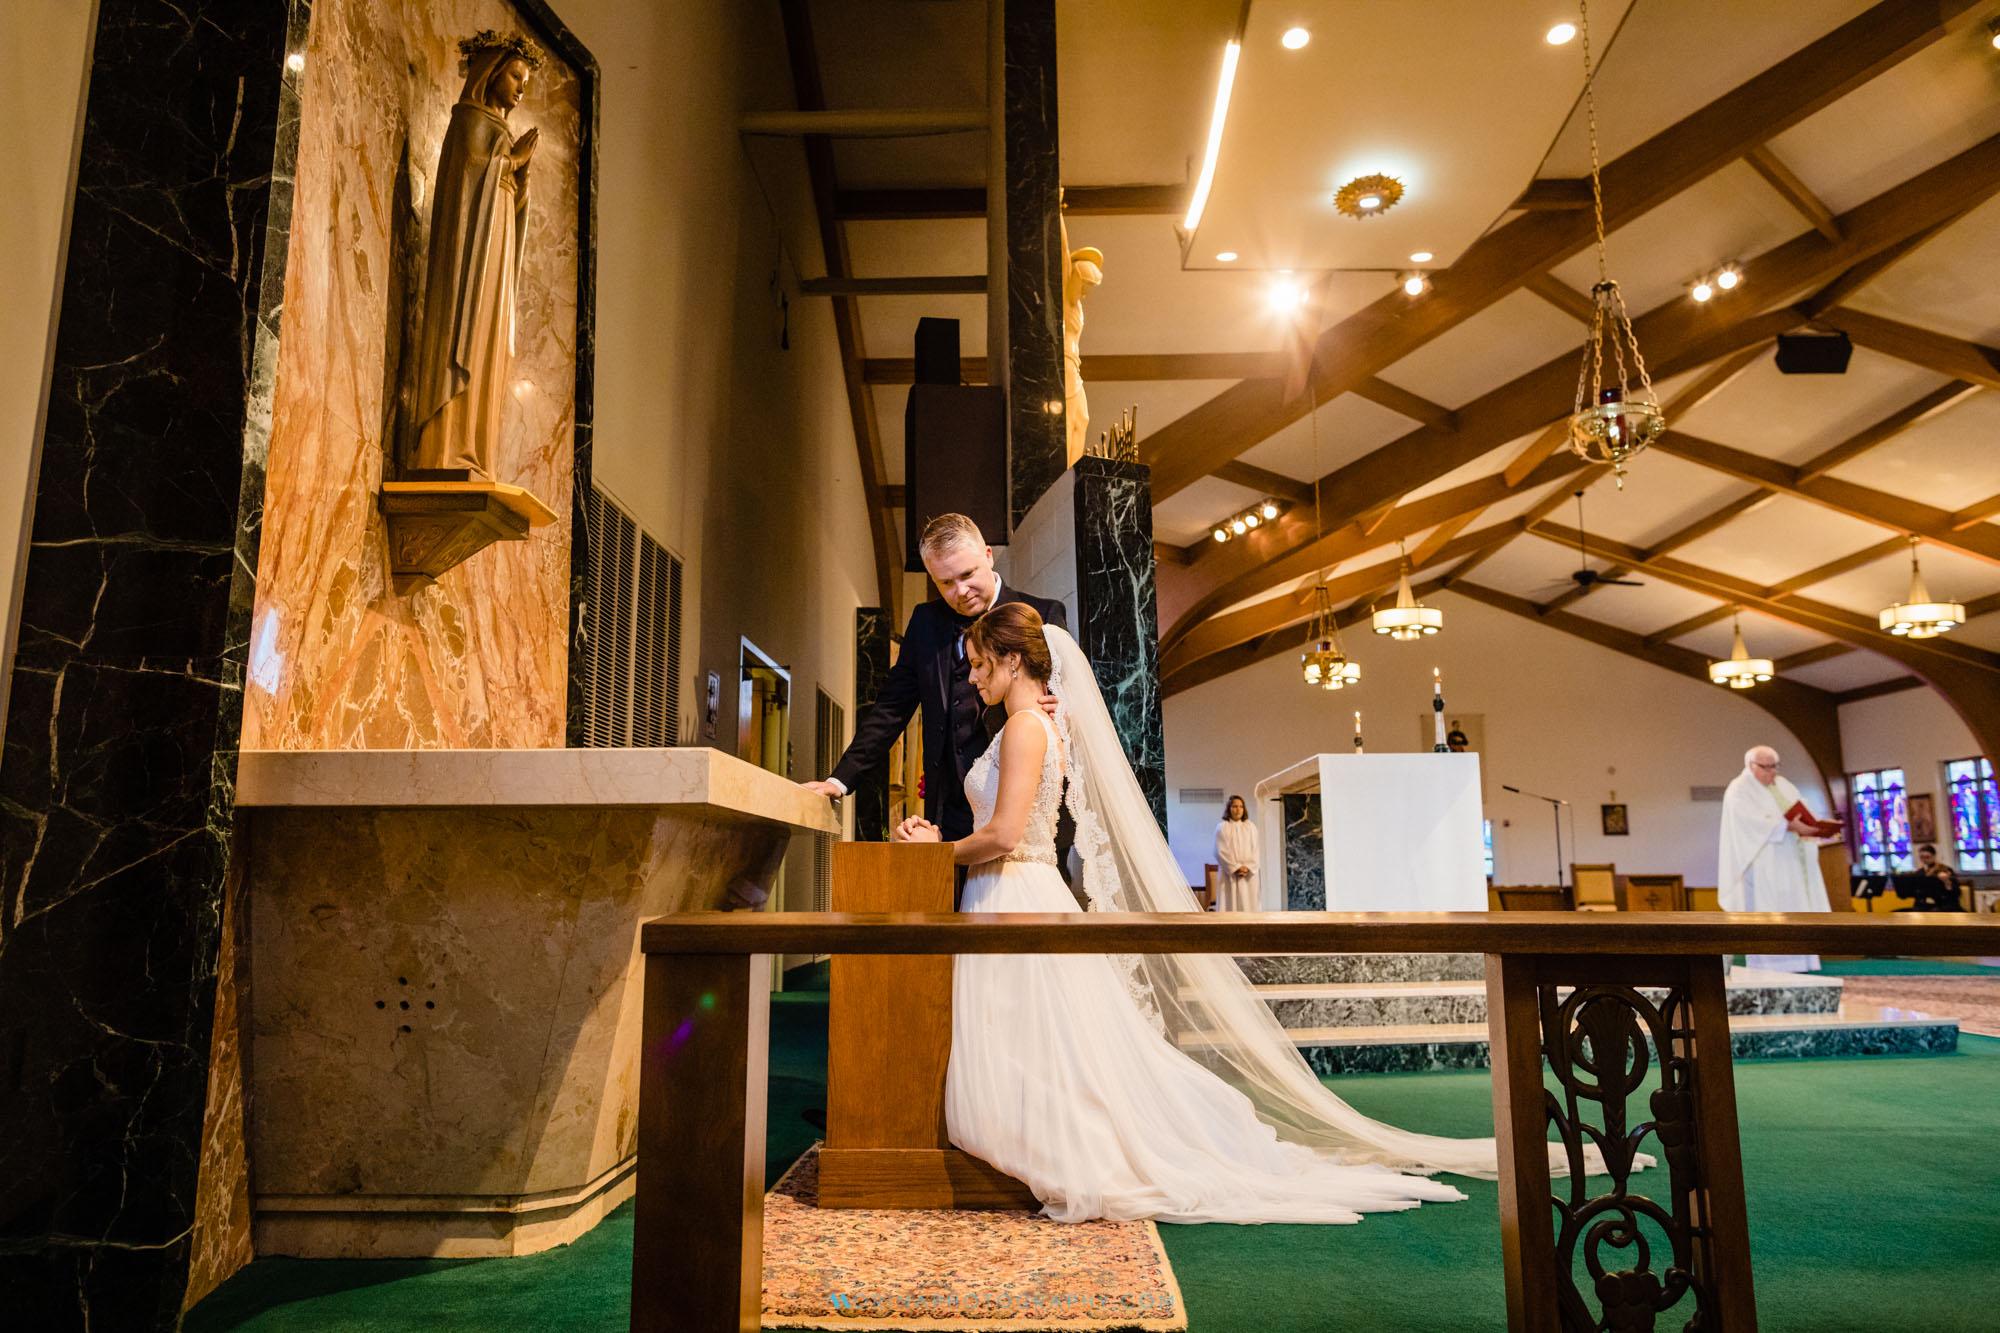 Colleen & Bill Wedding at Manufacturers' Golf & Country Club wedding 0045.jpg